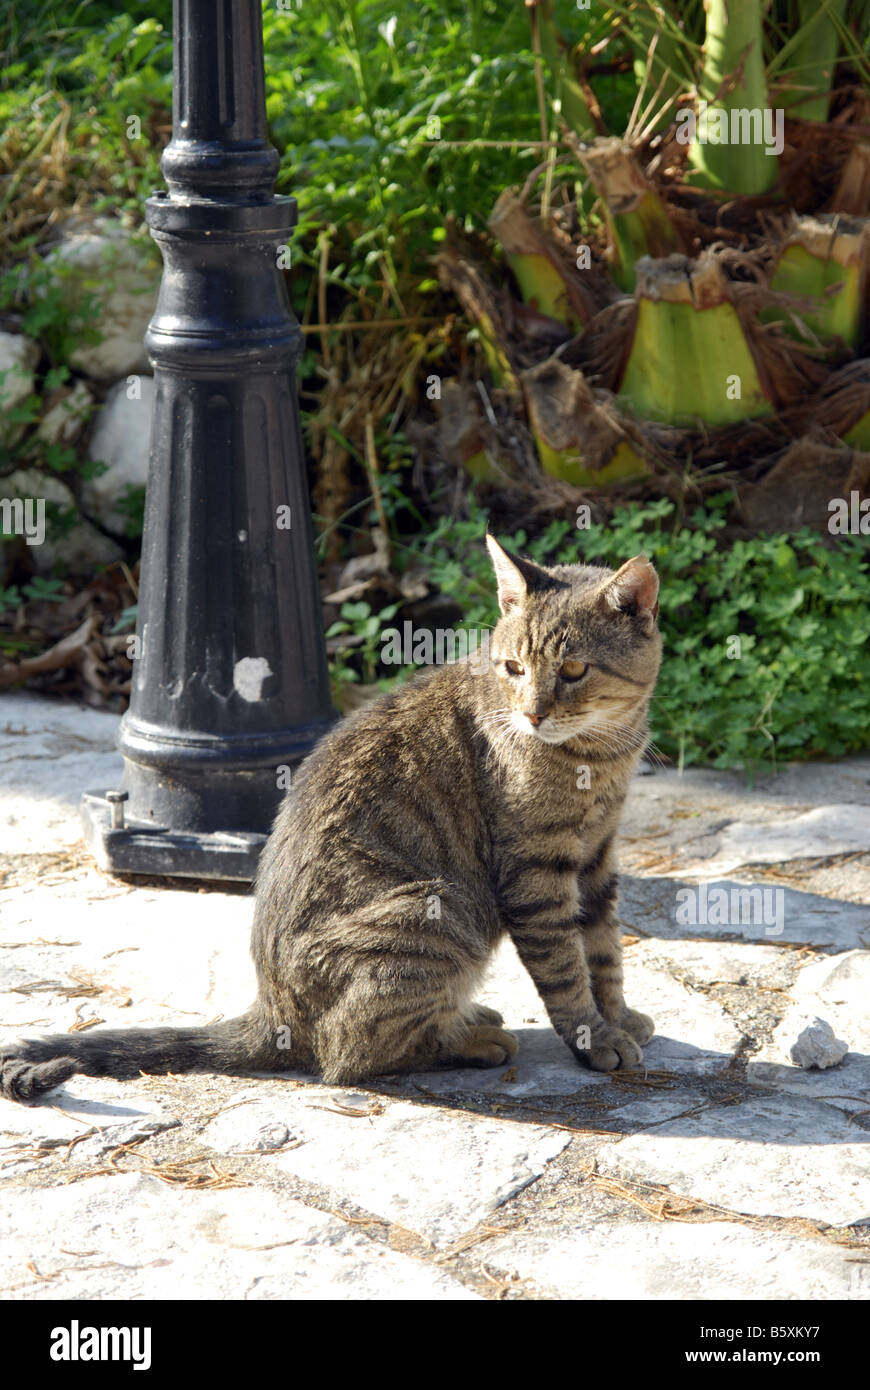 Feral cat at Assos, Kefallonia, Greek Ionian Islands - Stock Image